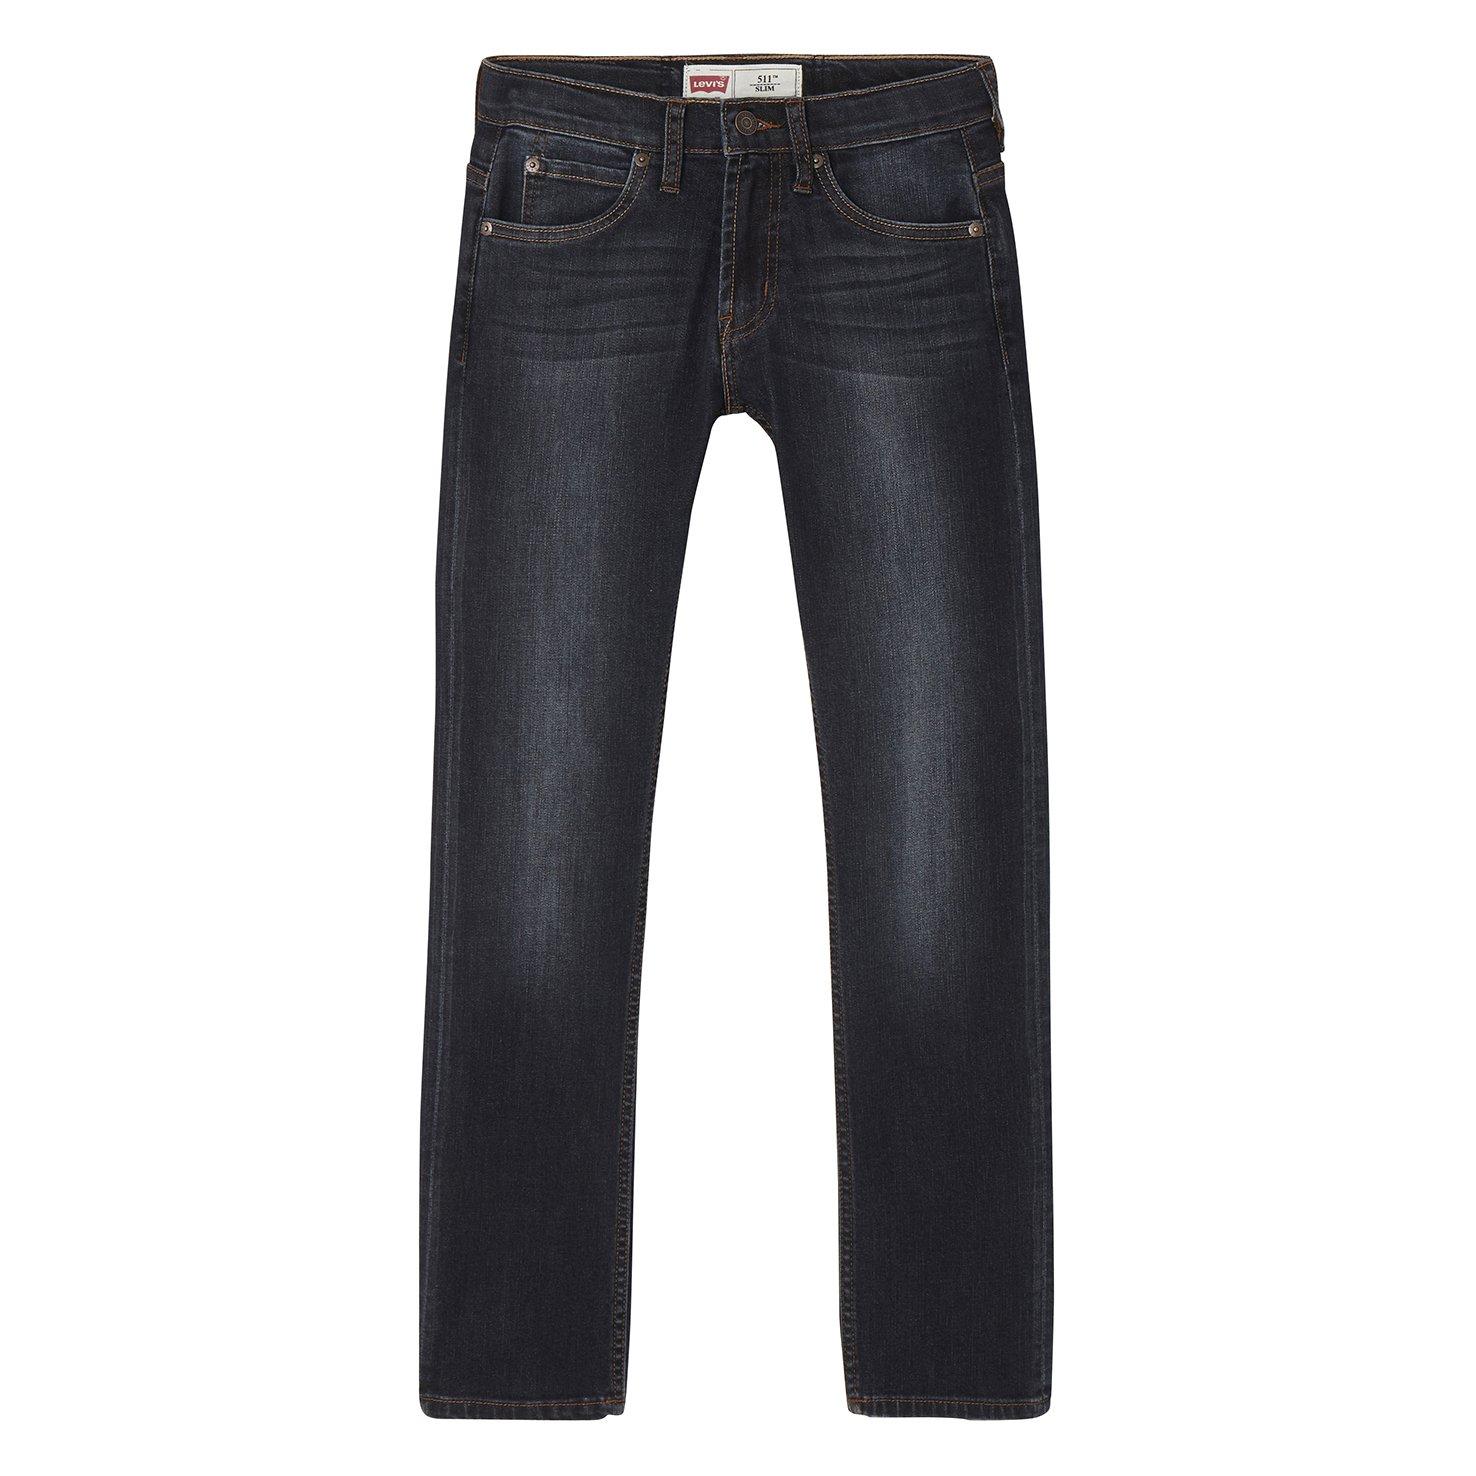 Levi's Kids Boy's Jeans Levi' s Kids NM22167